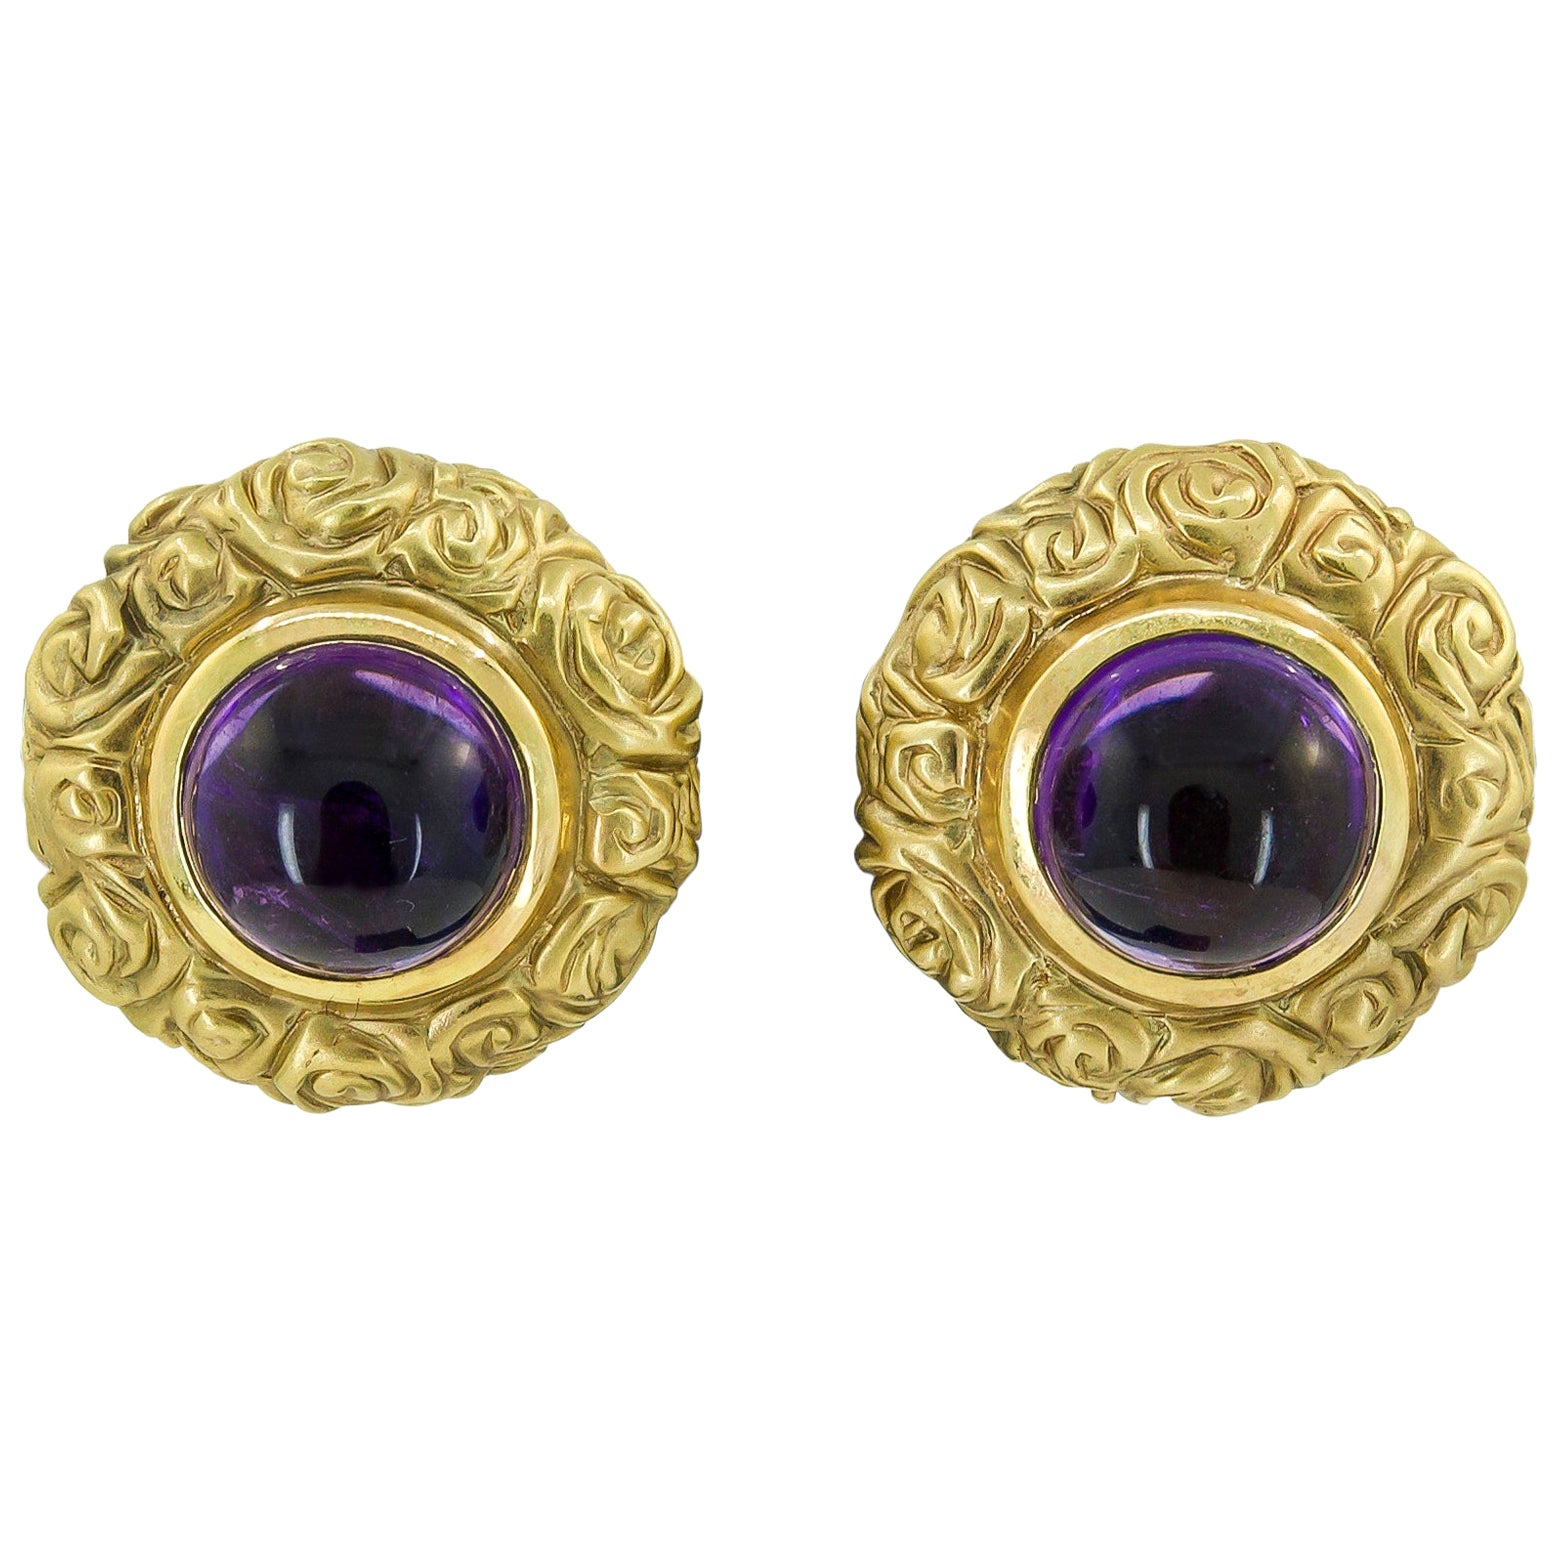 Cabochon Amethyst Yellow Gold Earrings